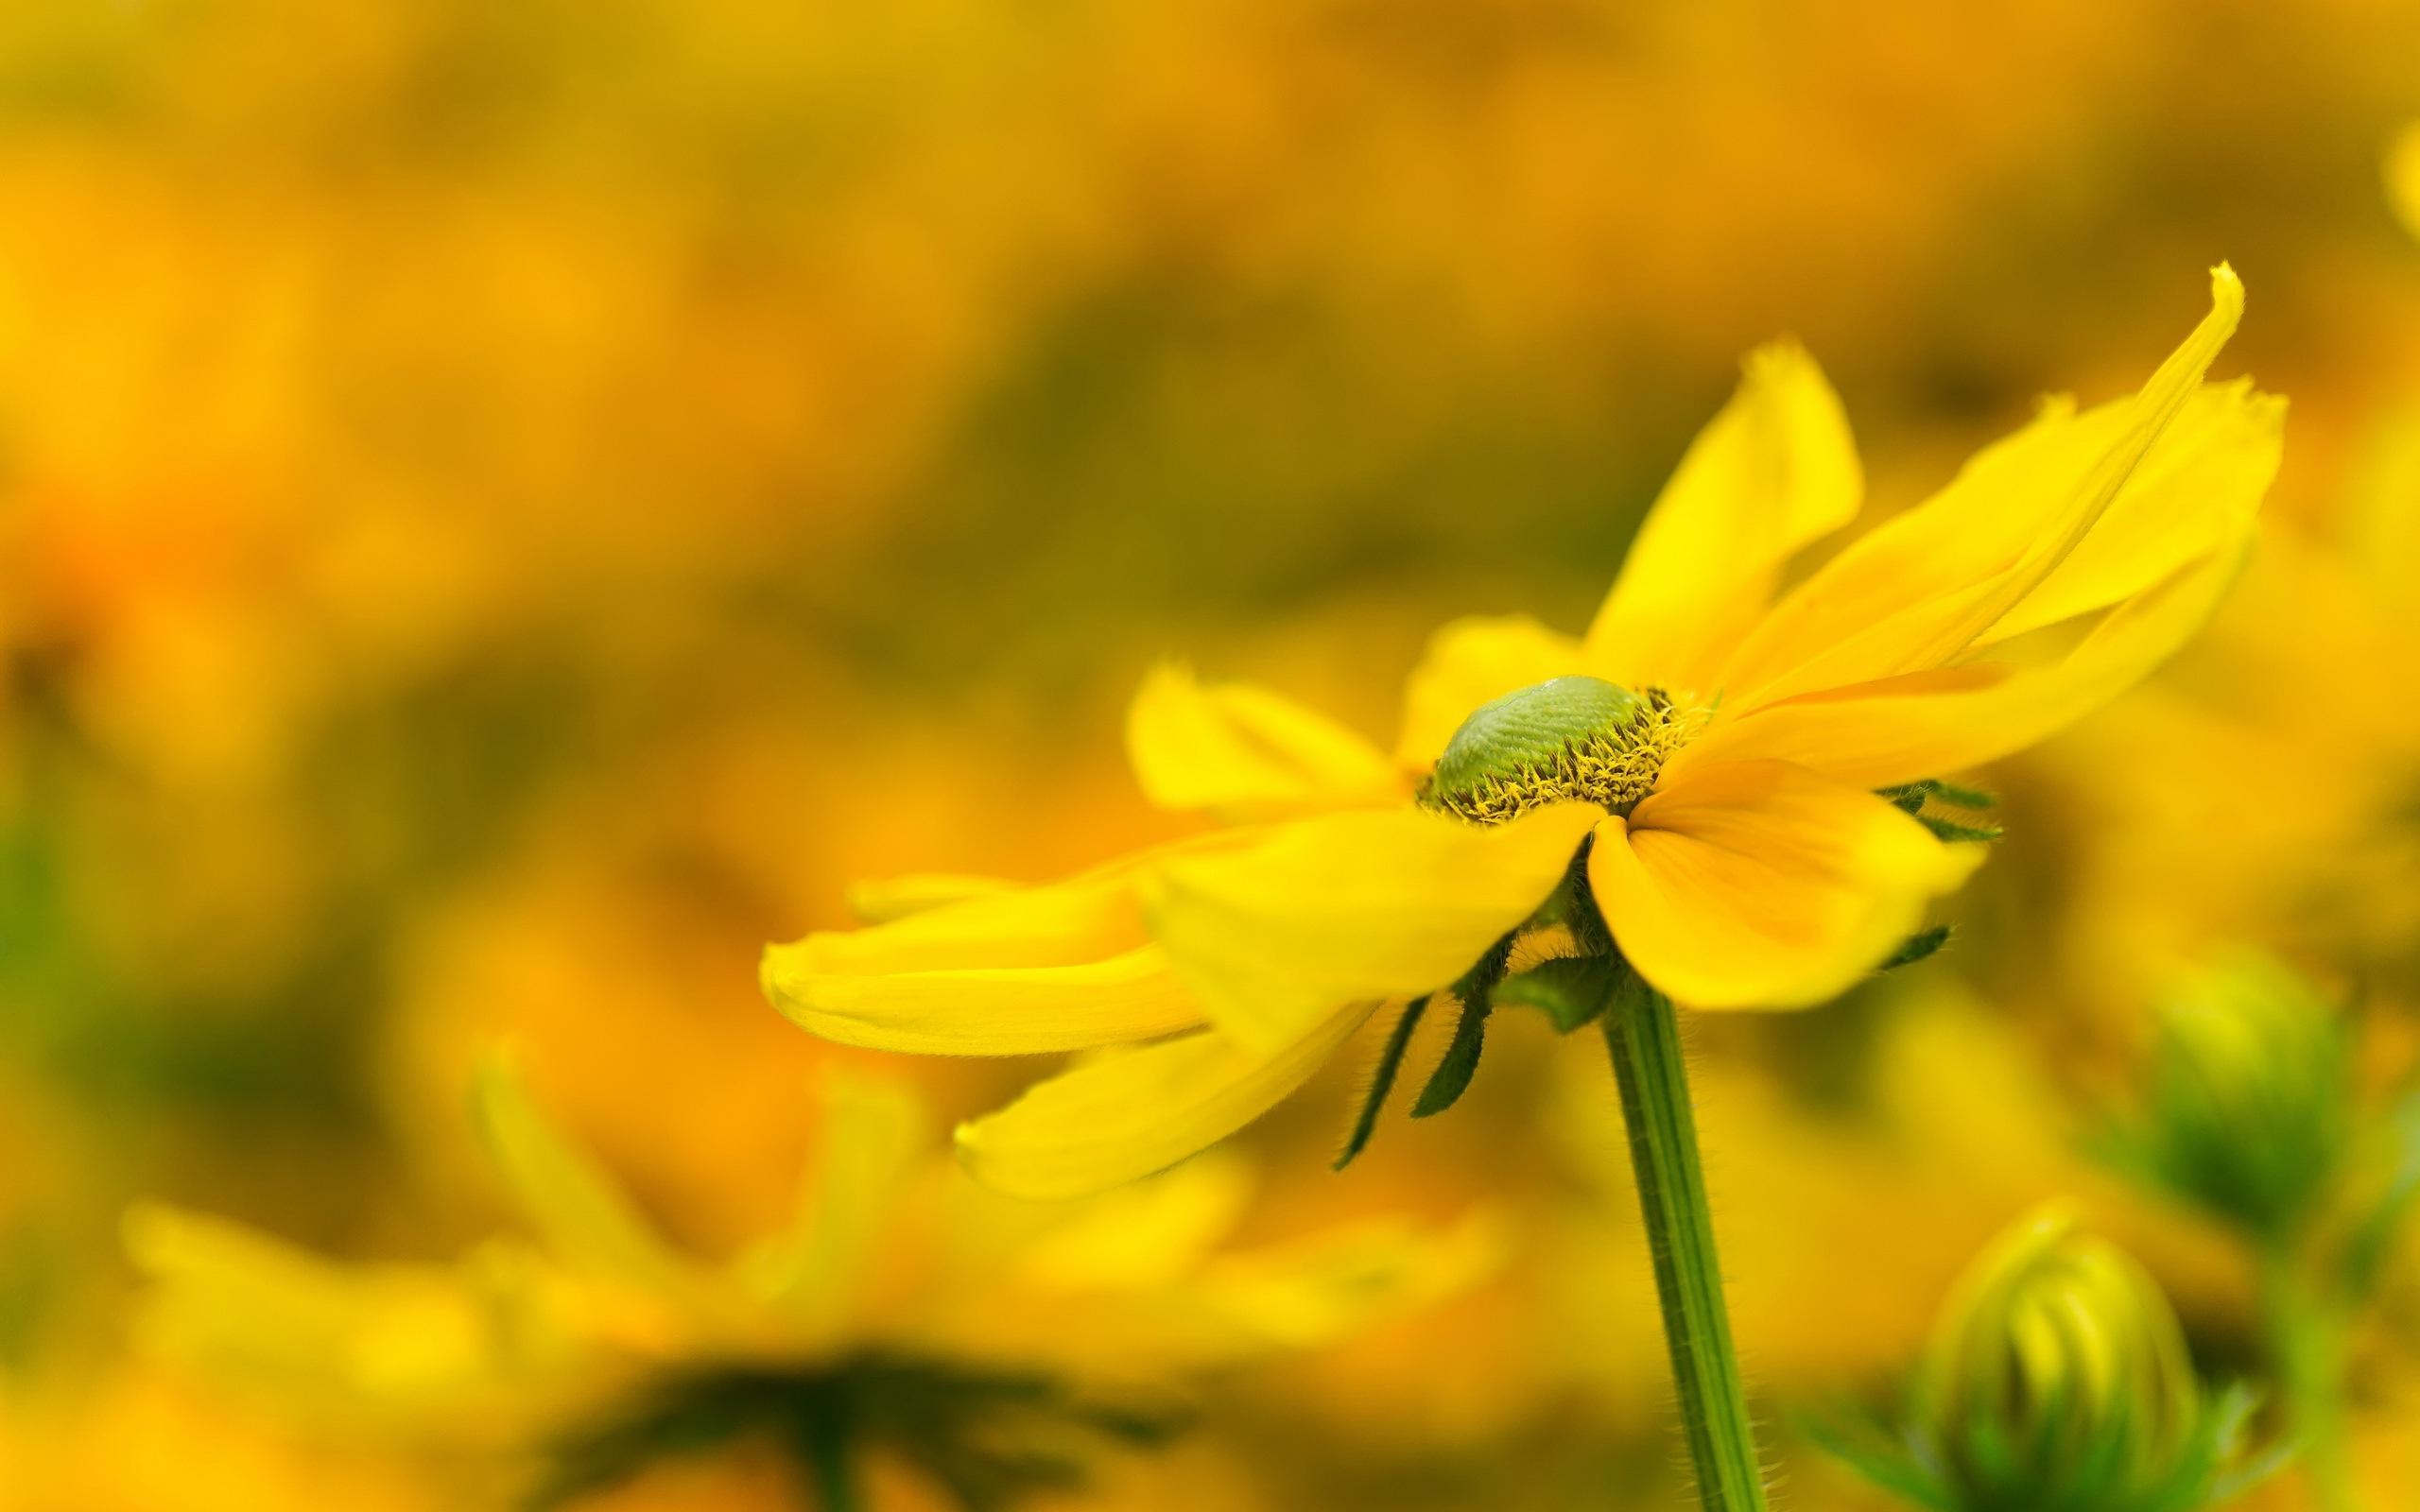 цветы макро желтые flowers macro yellow  № 910219 бесплатно